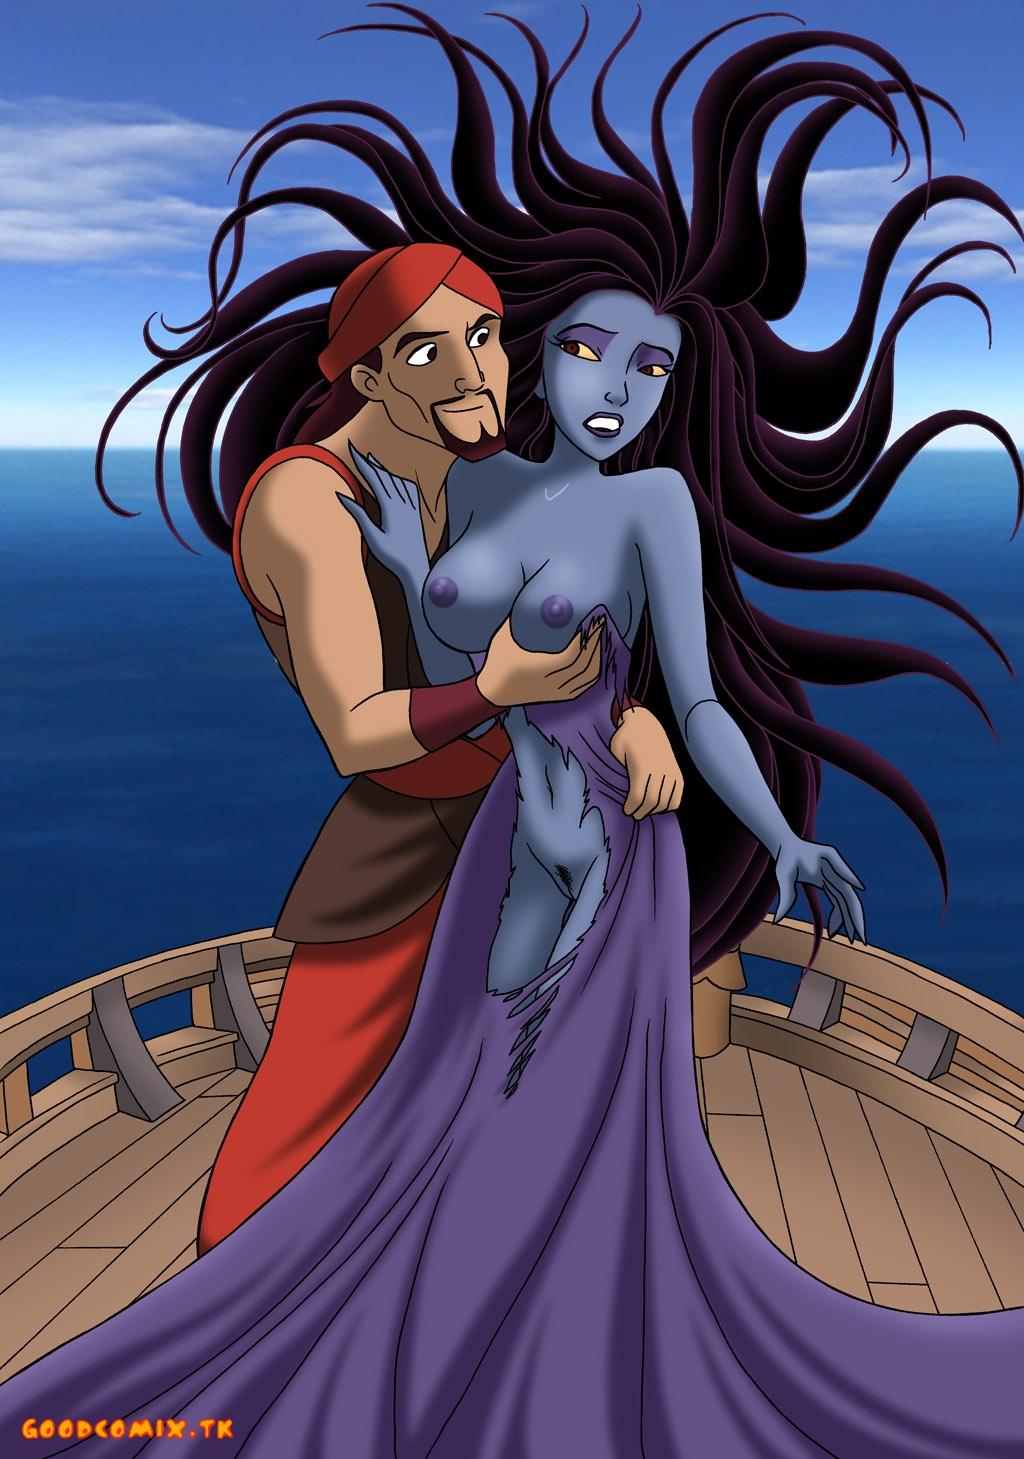 Goodcomix Sinbad Legend of the Seven Seas - [Palcomix] - Sinbad and Eris